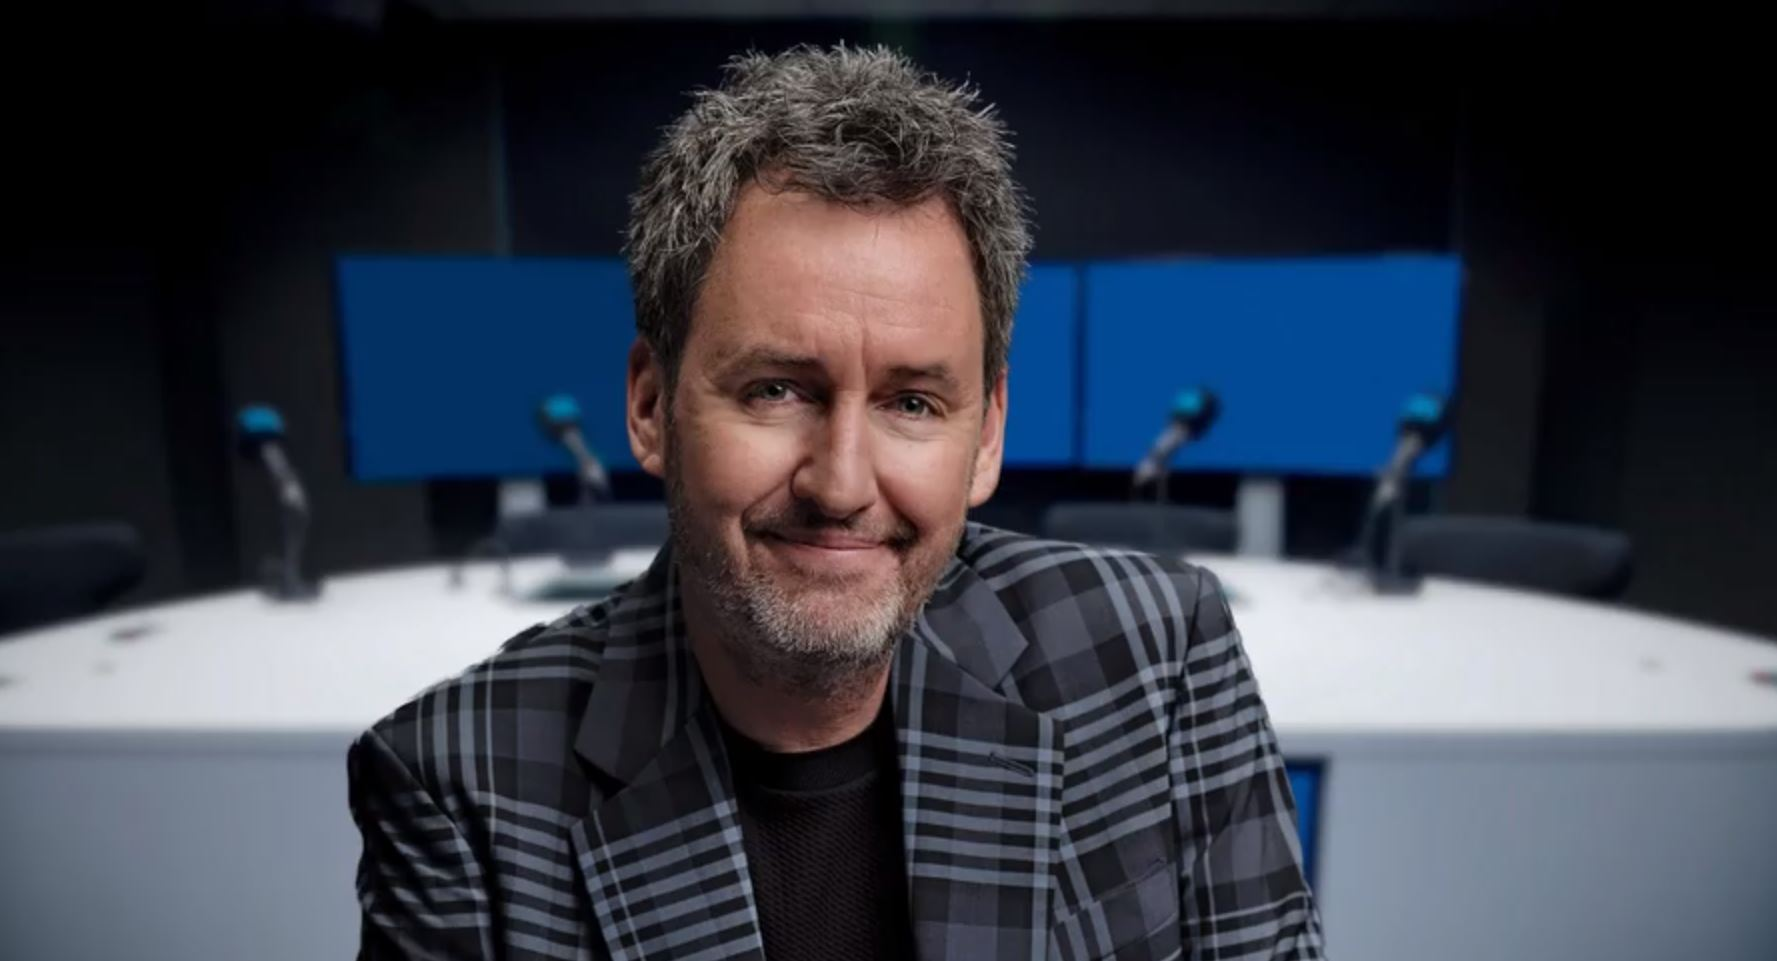 Newstalk ZB host Mike Hosking. Photo: NZH